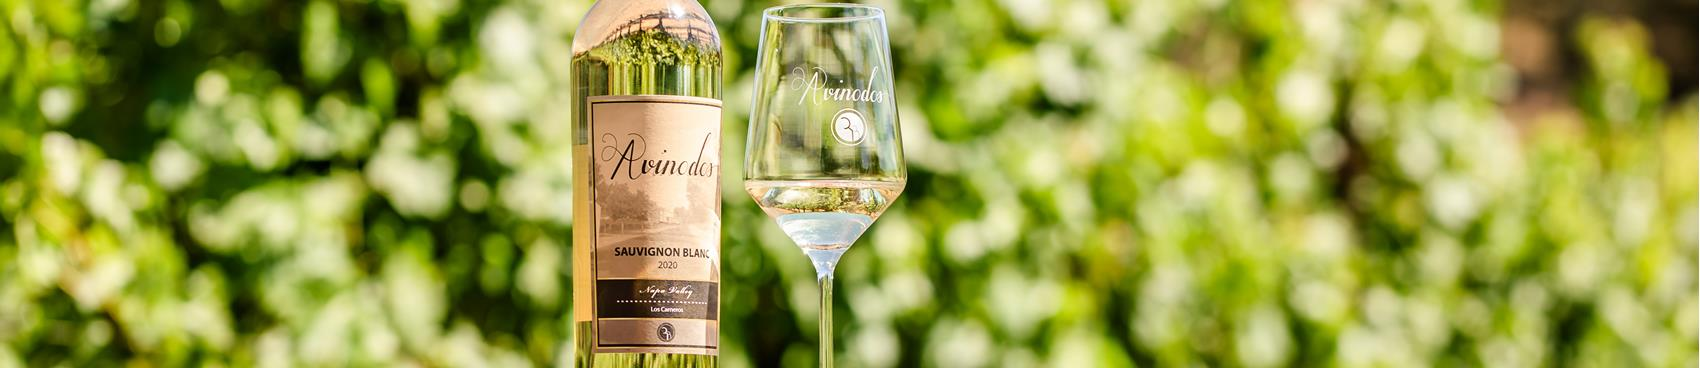 A image of AvinoDos Wines